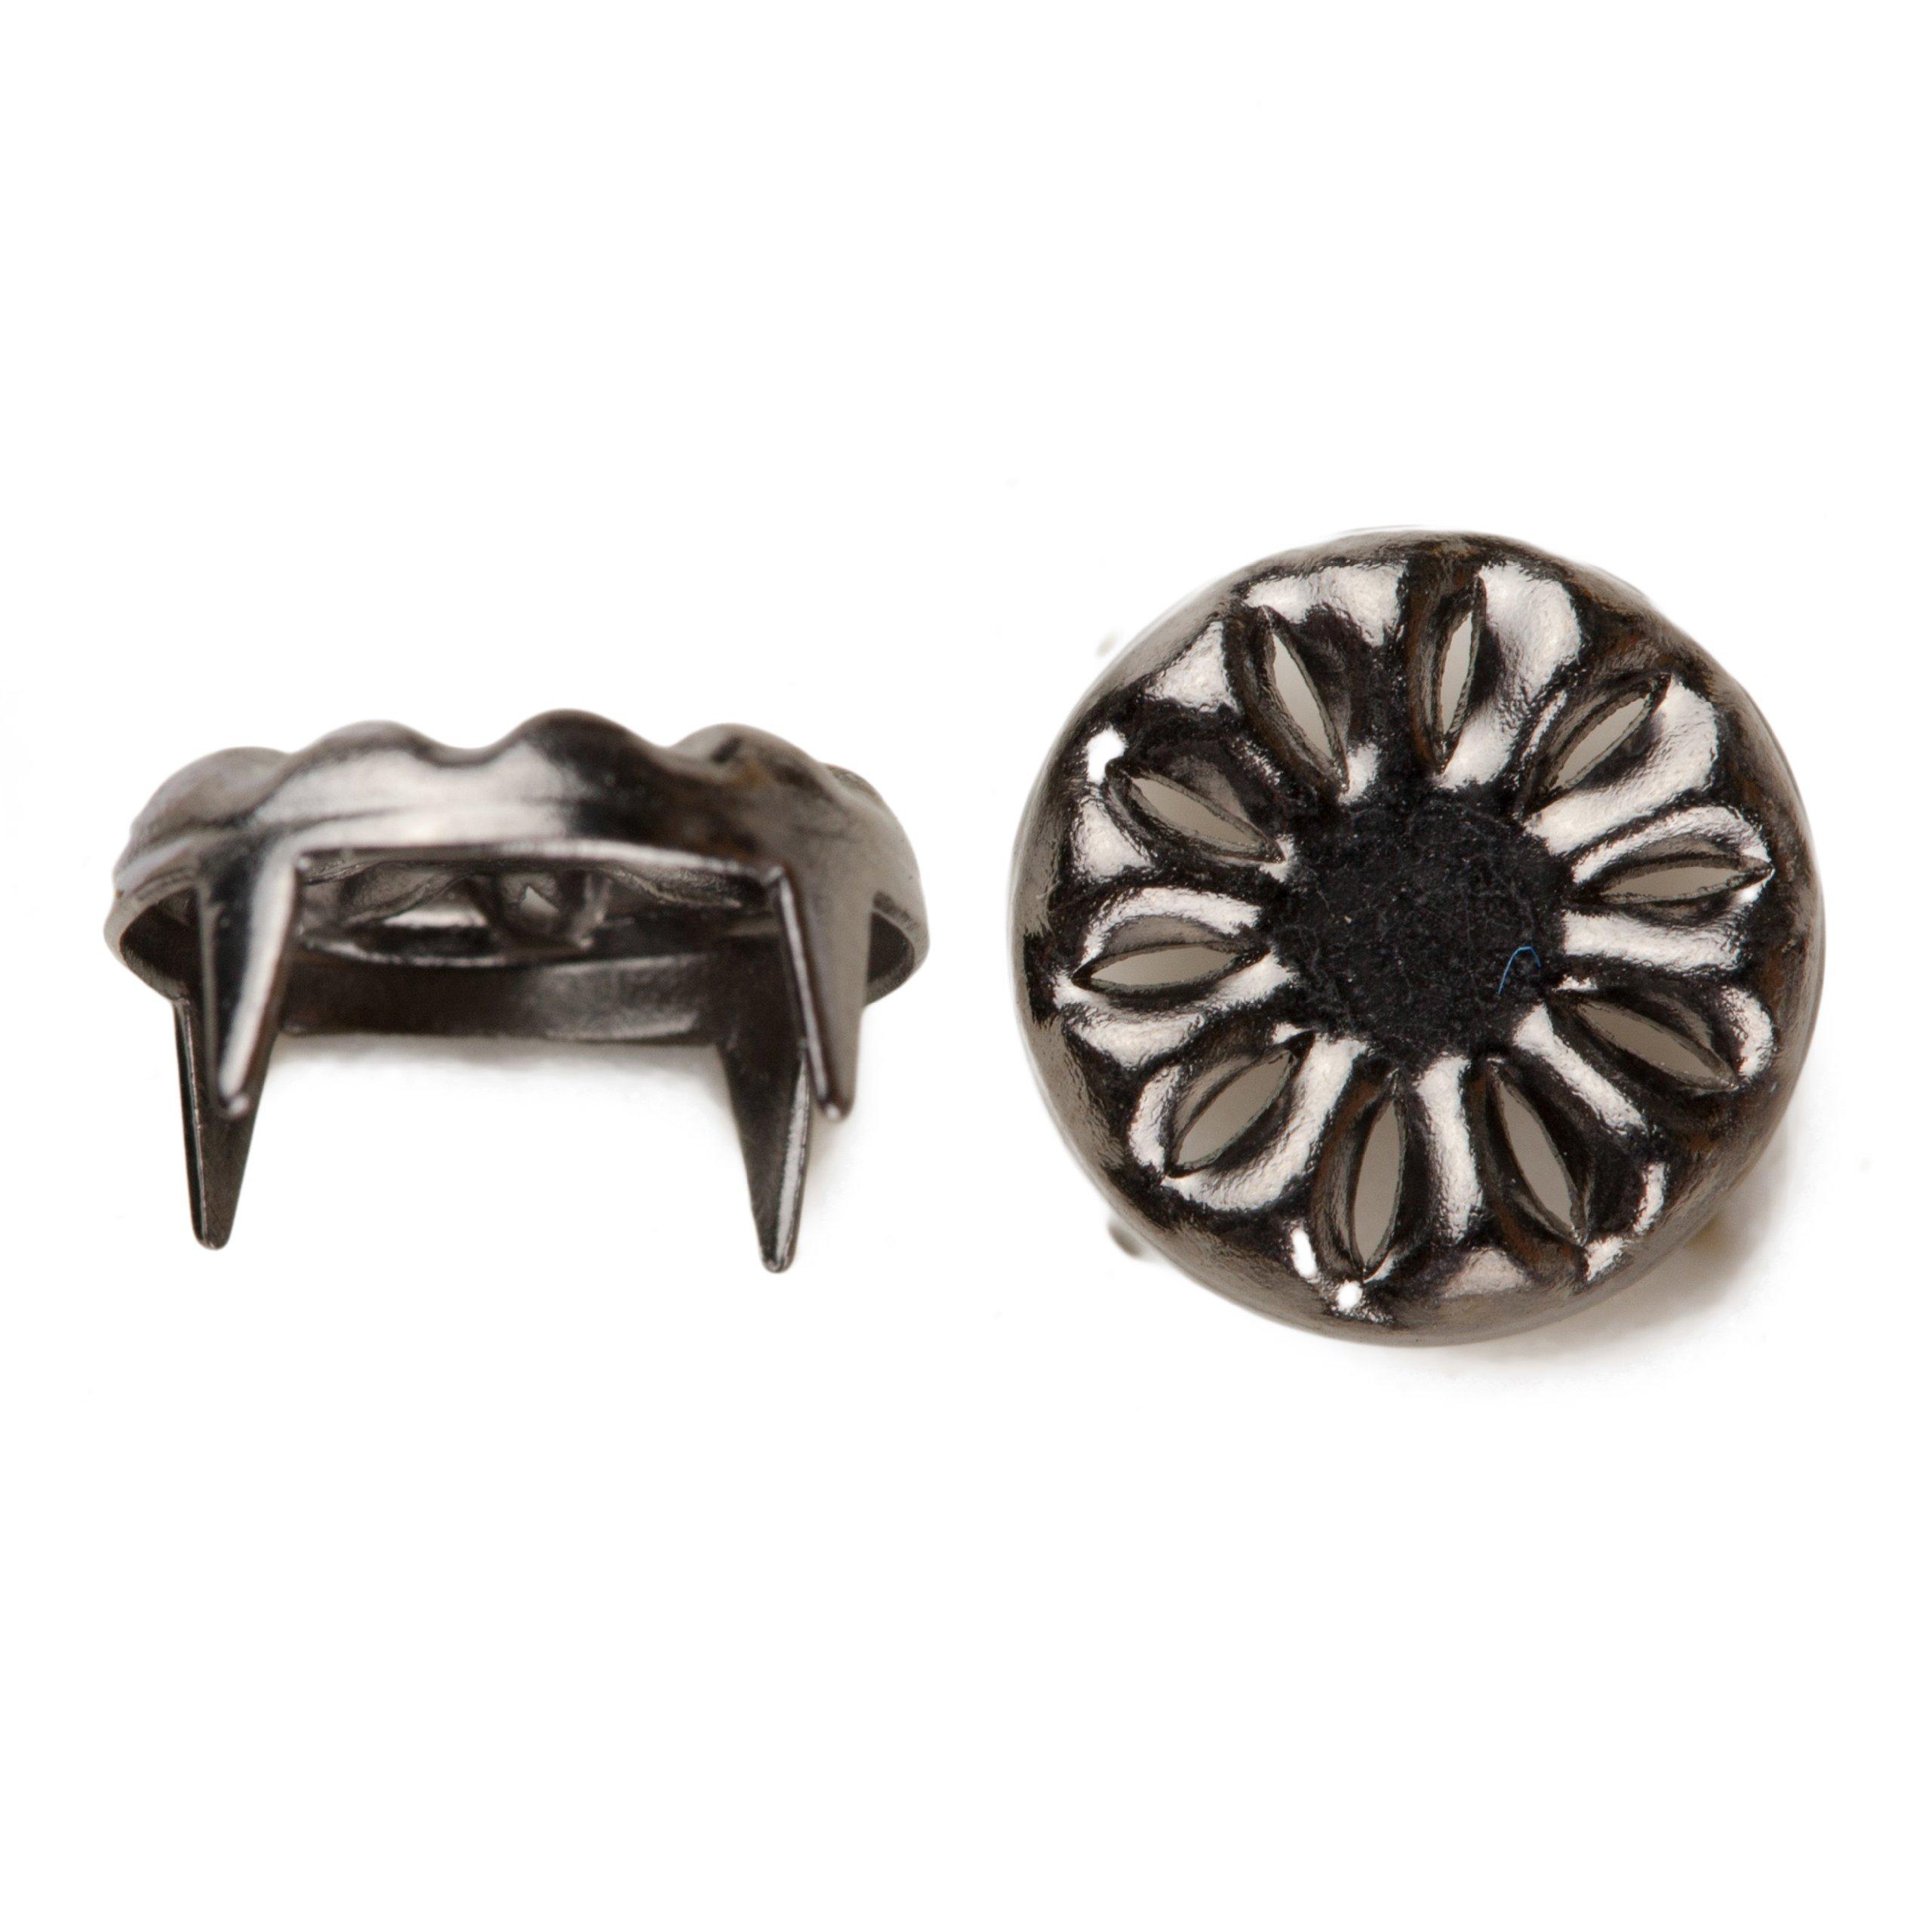 C&C Metal Products  8726  Filigree